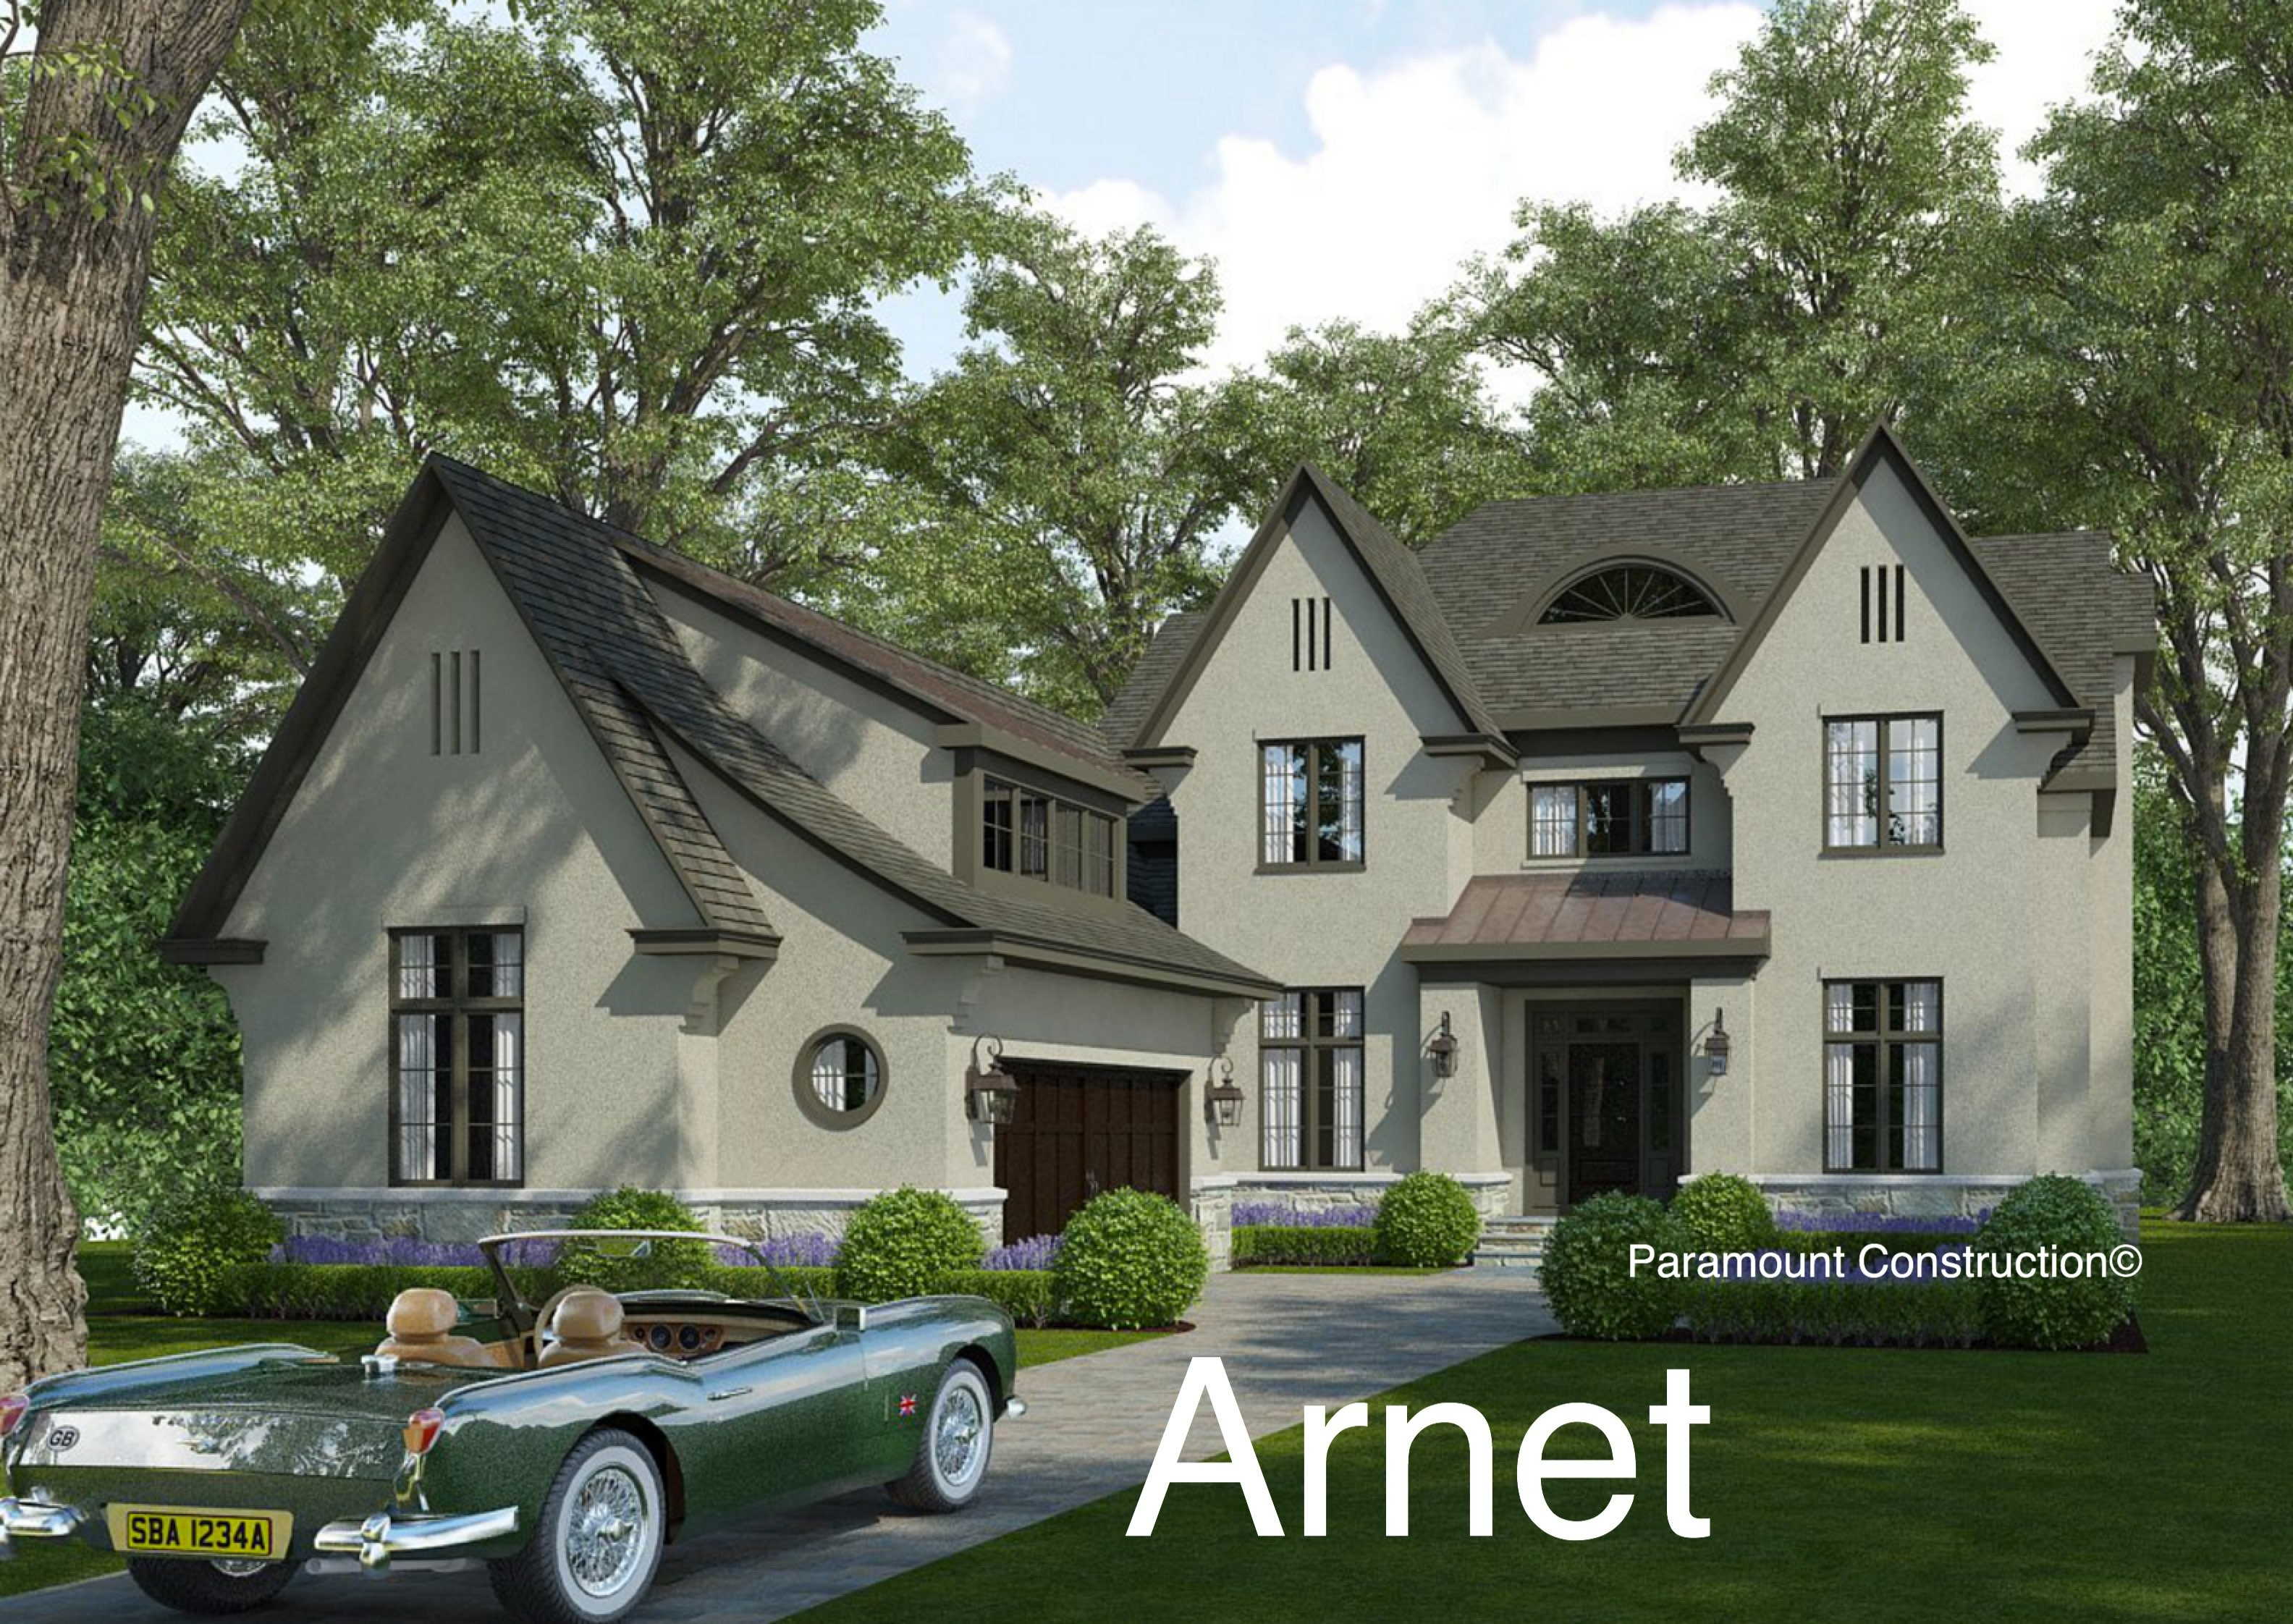 Arnet-220170317121336